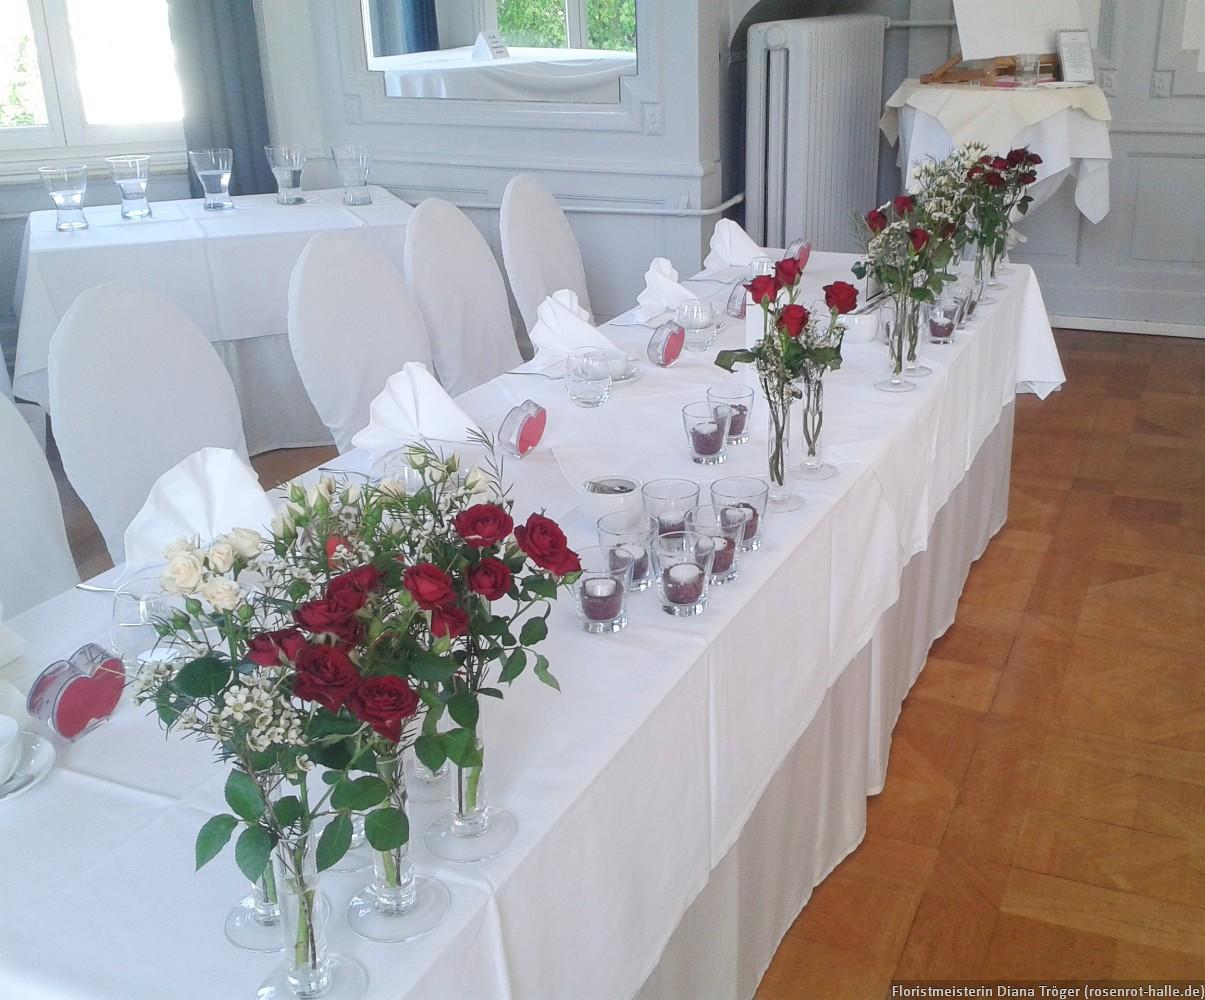 Tischdekoration Floristmeisterin Diana Troger